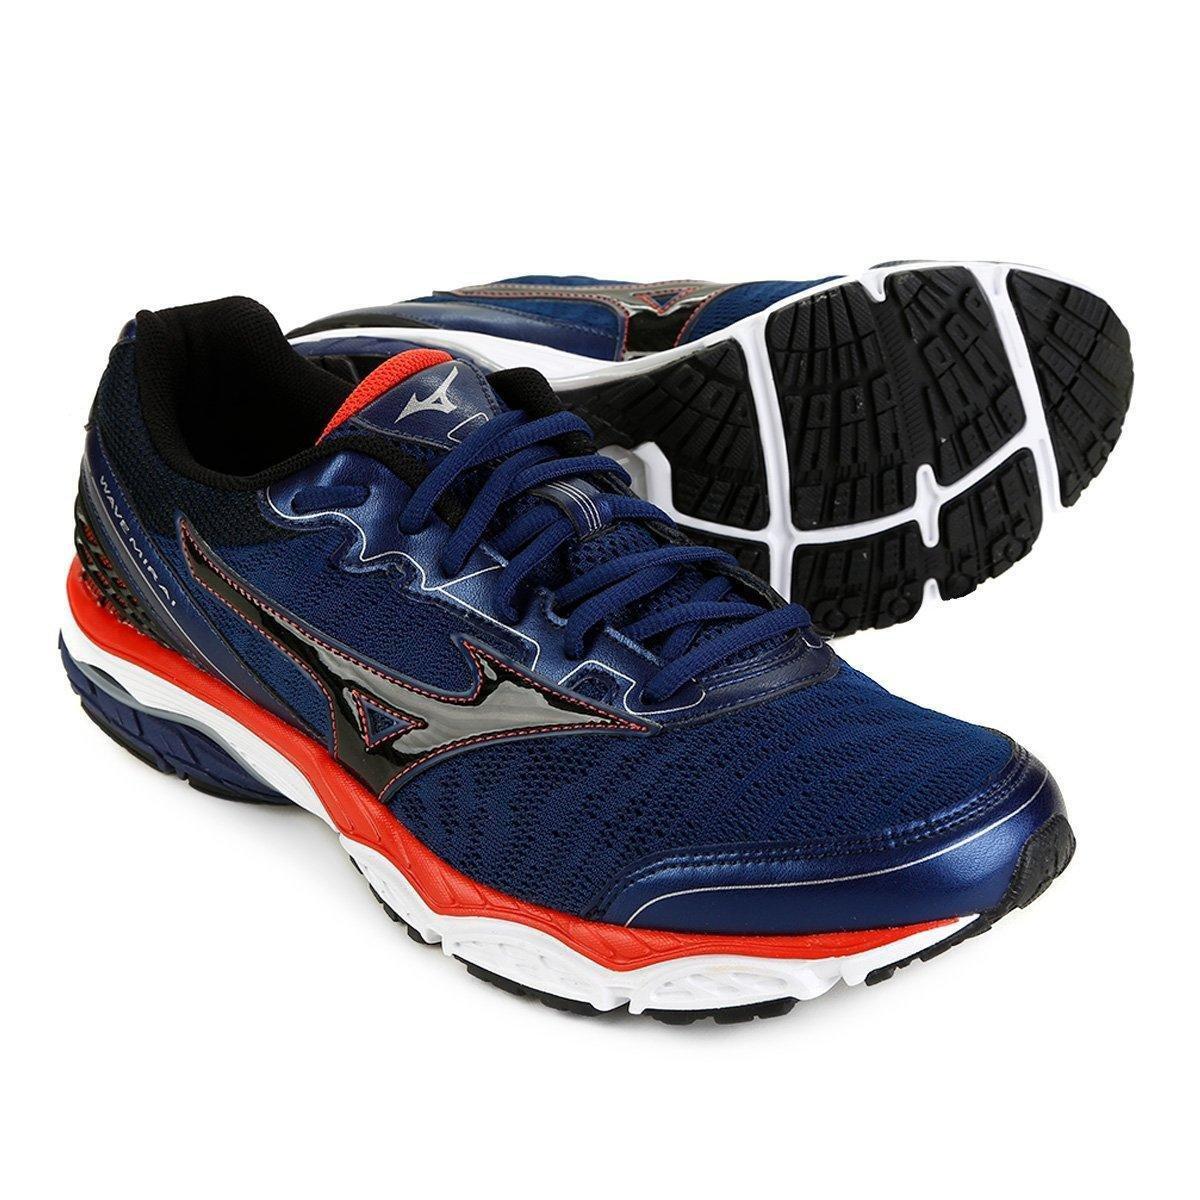 2690c97d4d616 FornecedorNetshoes. Tênis Mizuno Wave Mirai Masculino